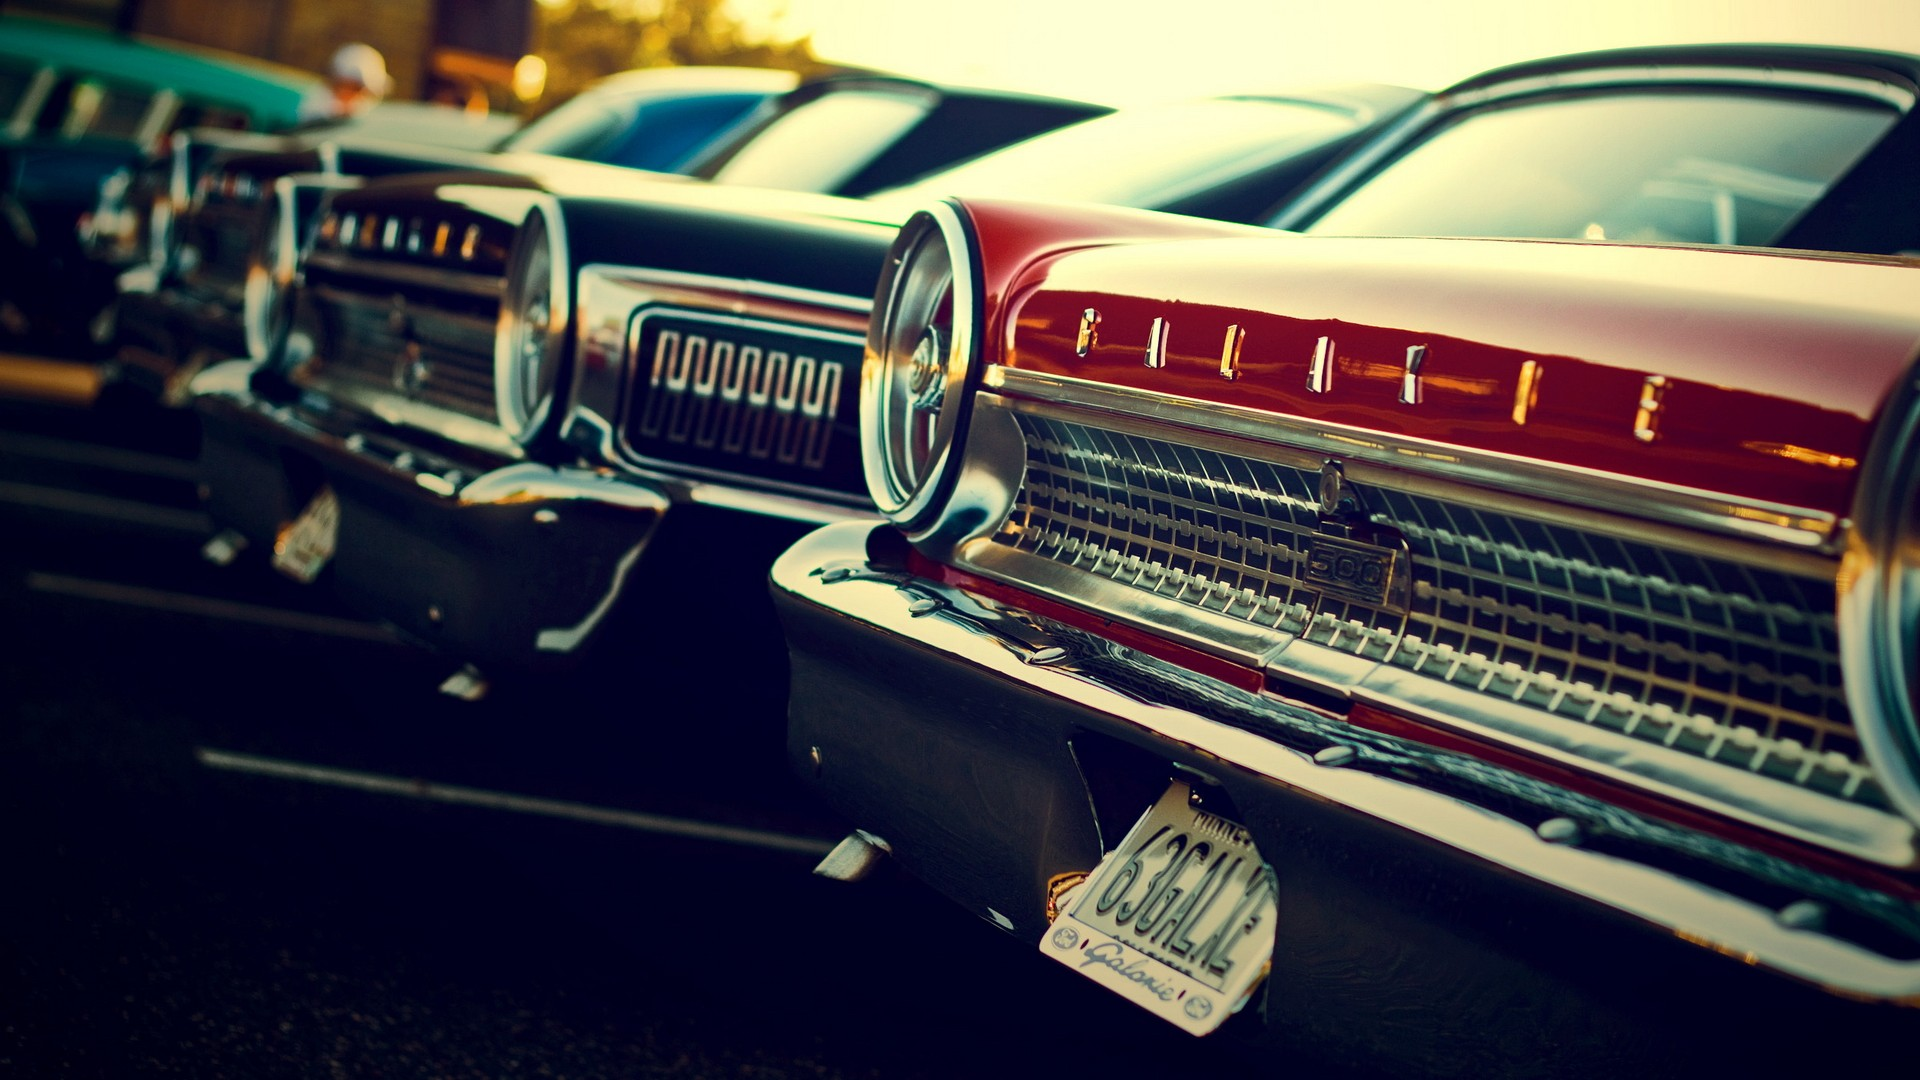 classic cars wallpaper 1920x1080 Wallpapers HD 1080p Desktop 1920x1080